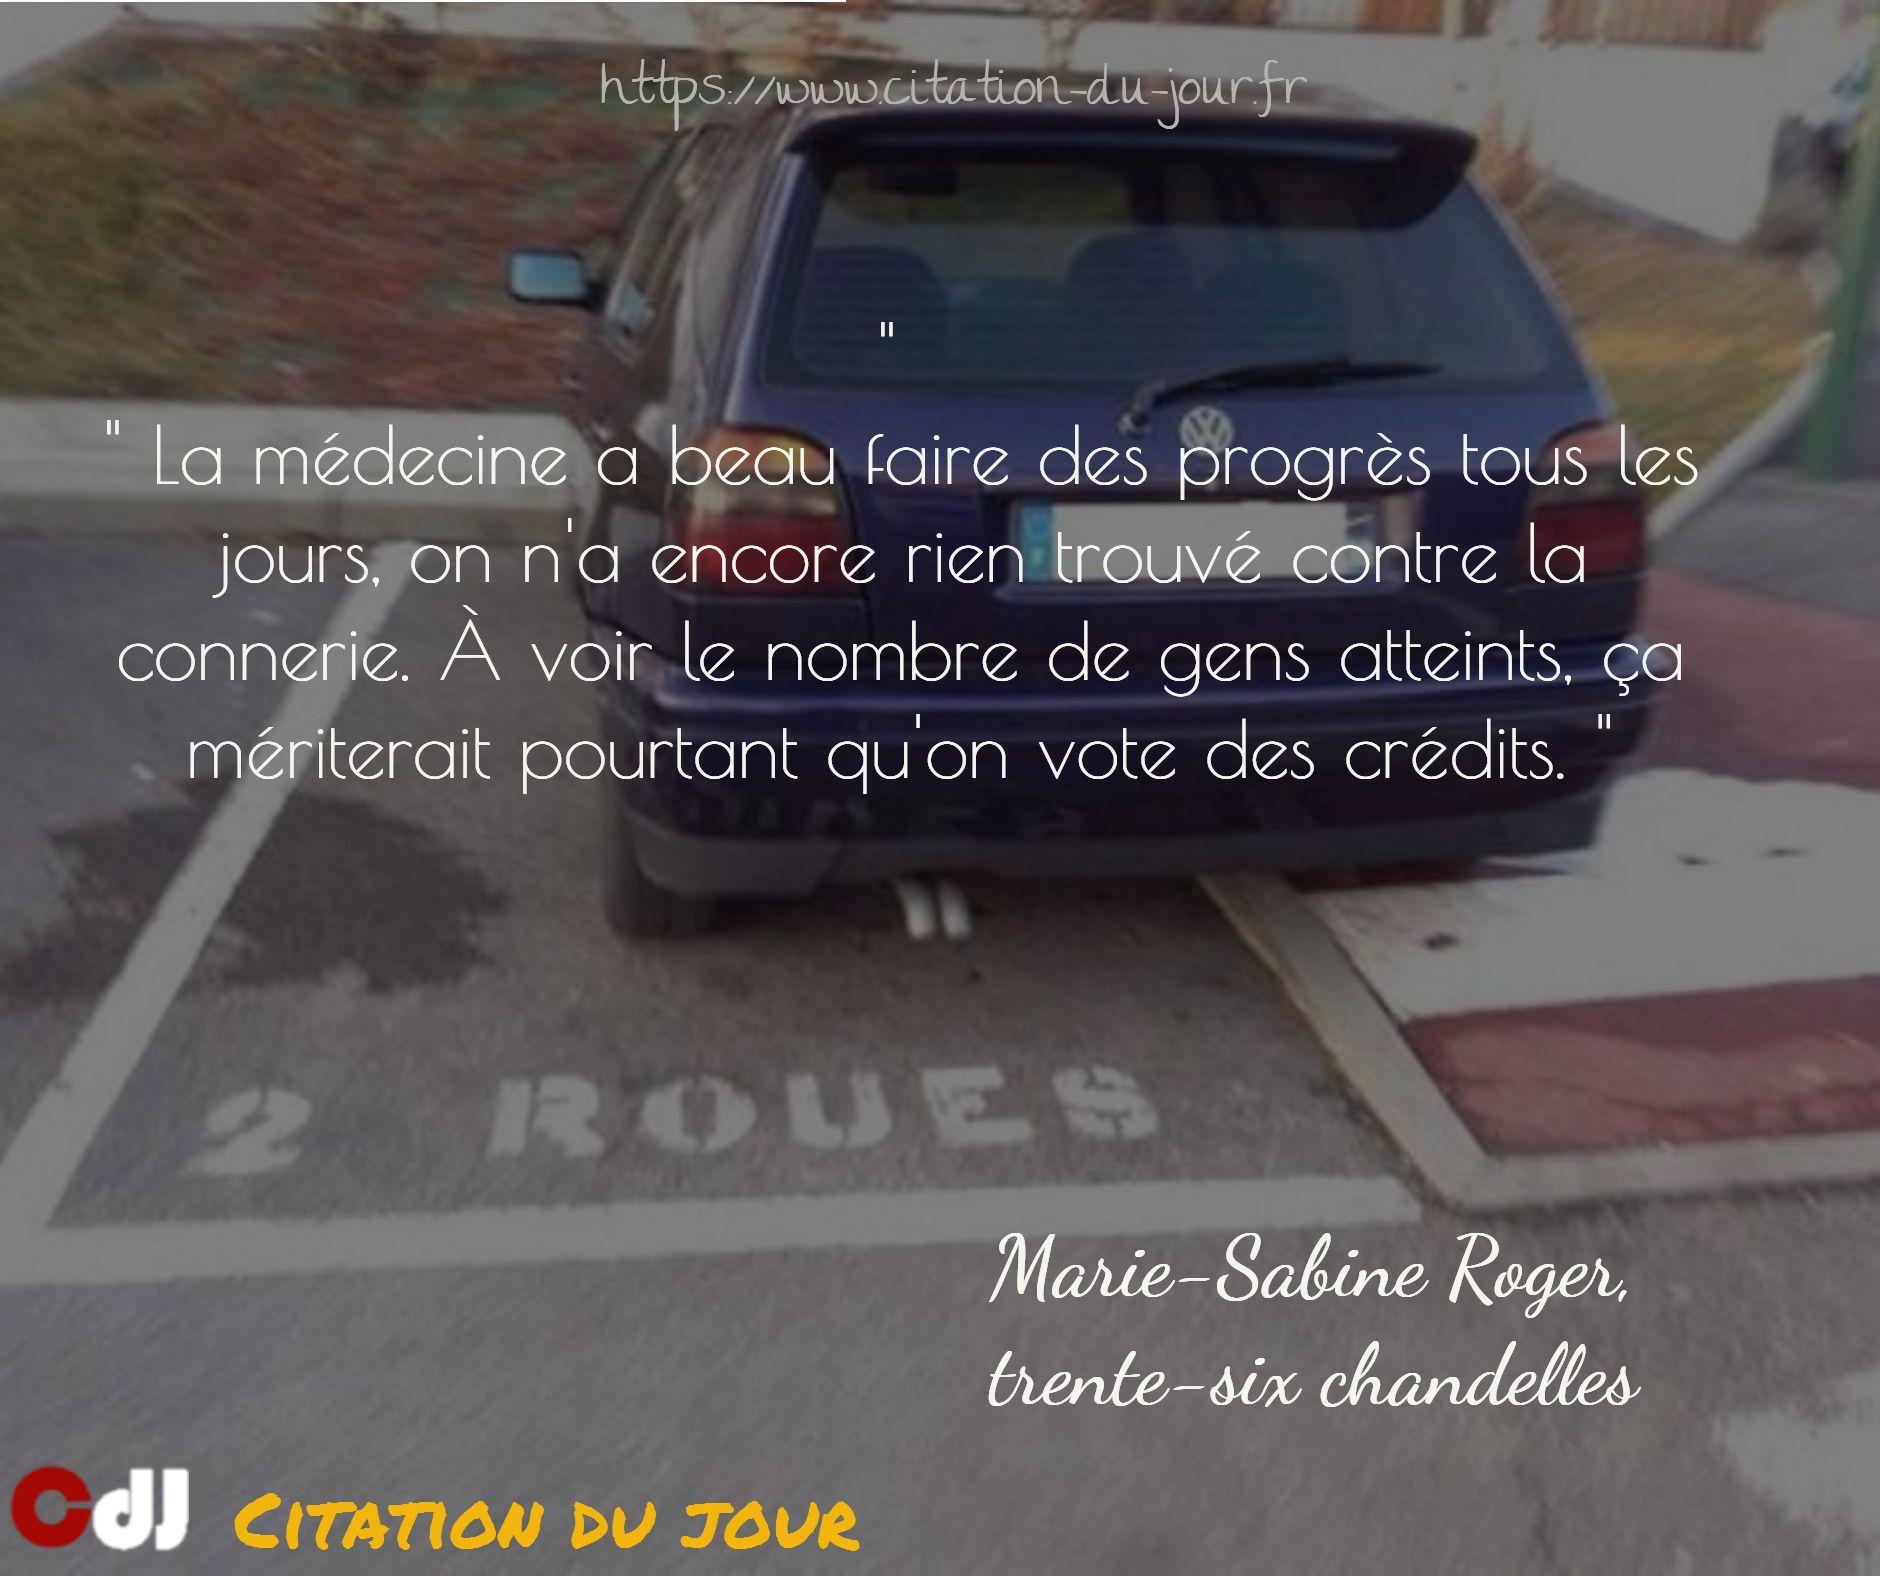 http://www.citation-du-jour.fr/citations-marie-sabine-roger-12991.html